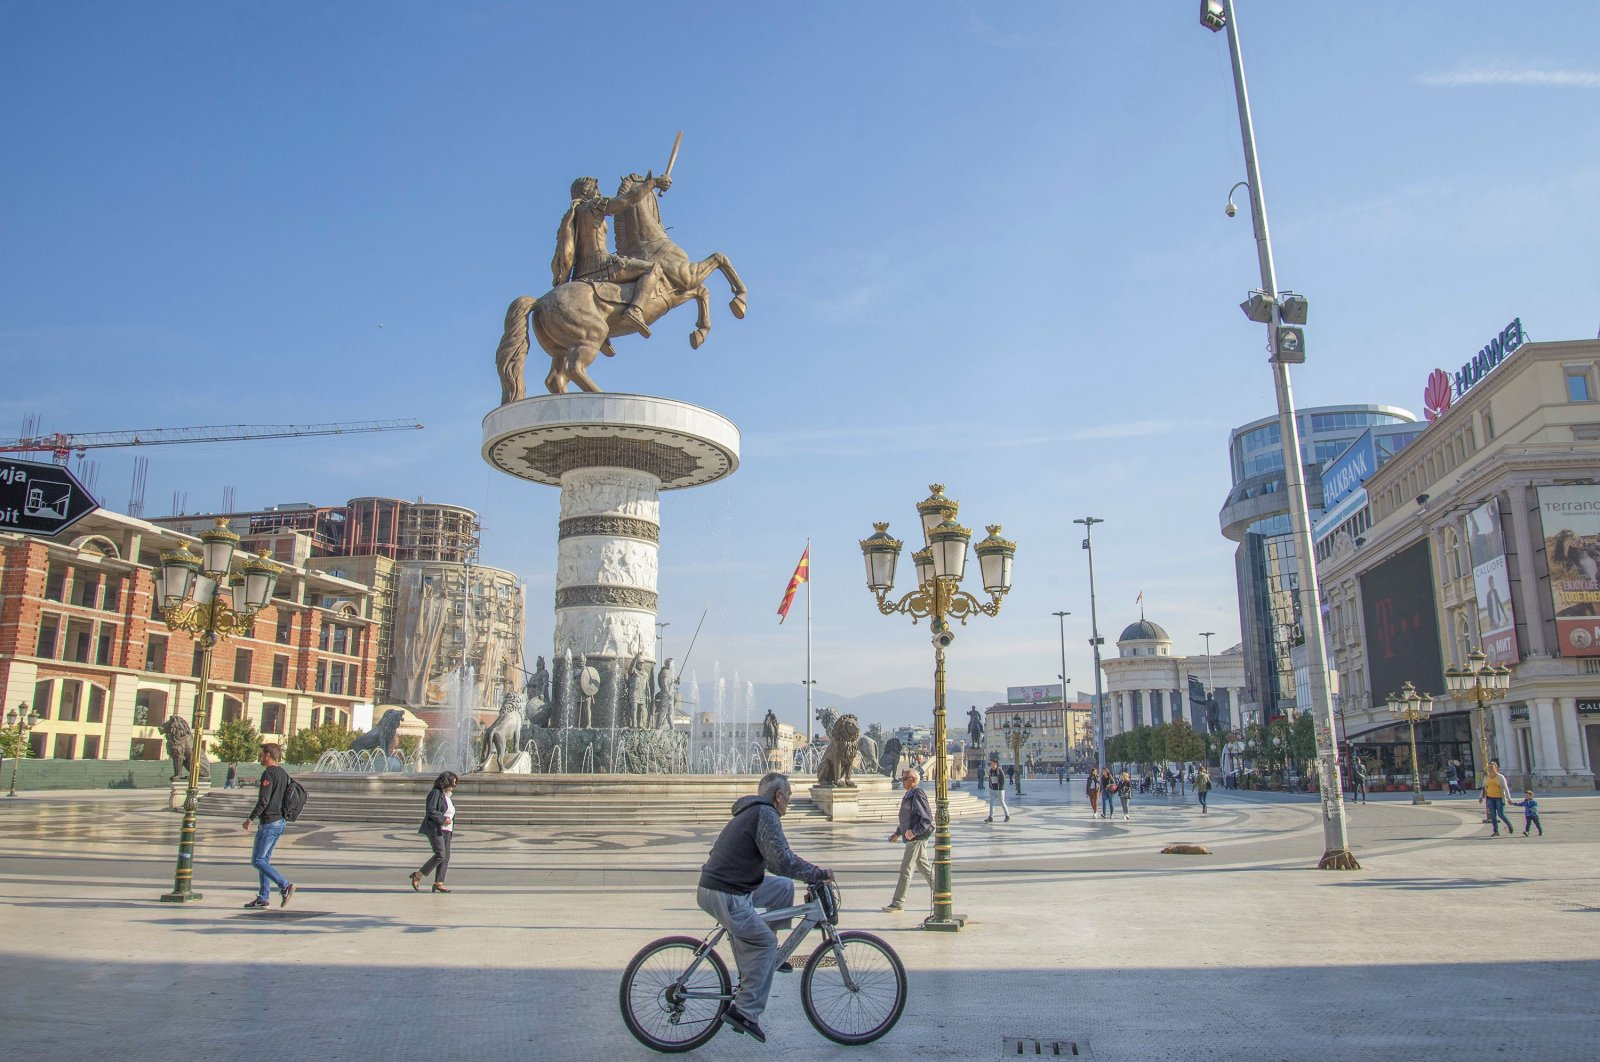 Macedonian square in the city of Skopje, North Macedonia, Oct. 2, 2018. (Shutterstock Photo)